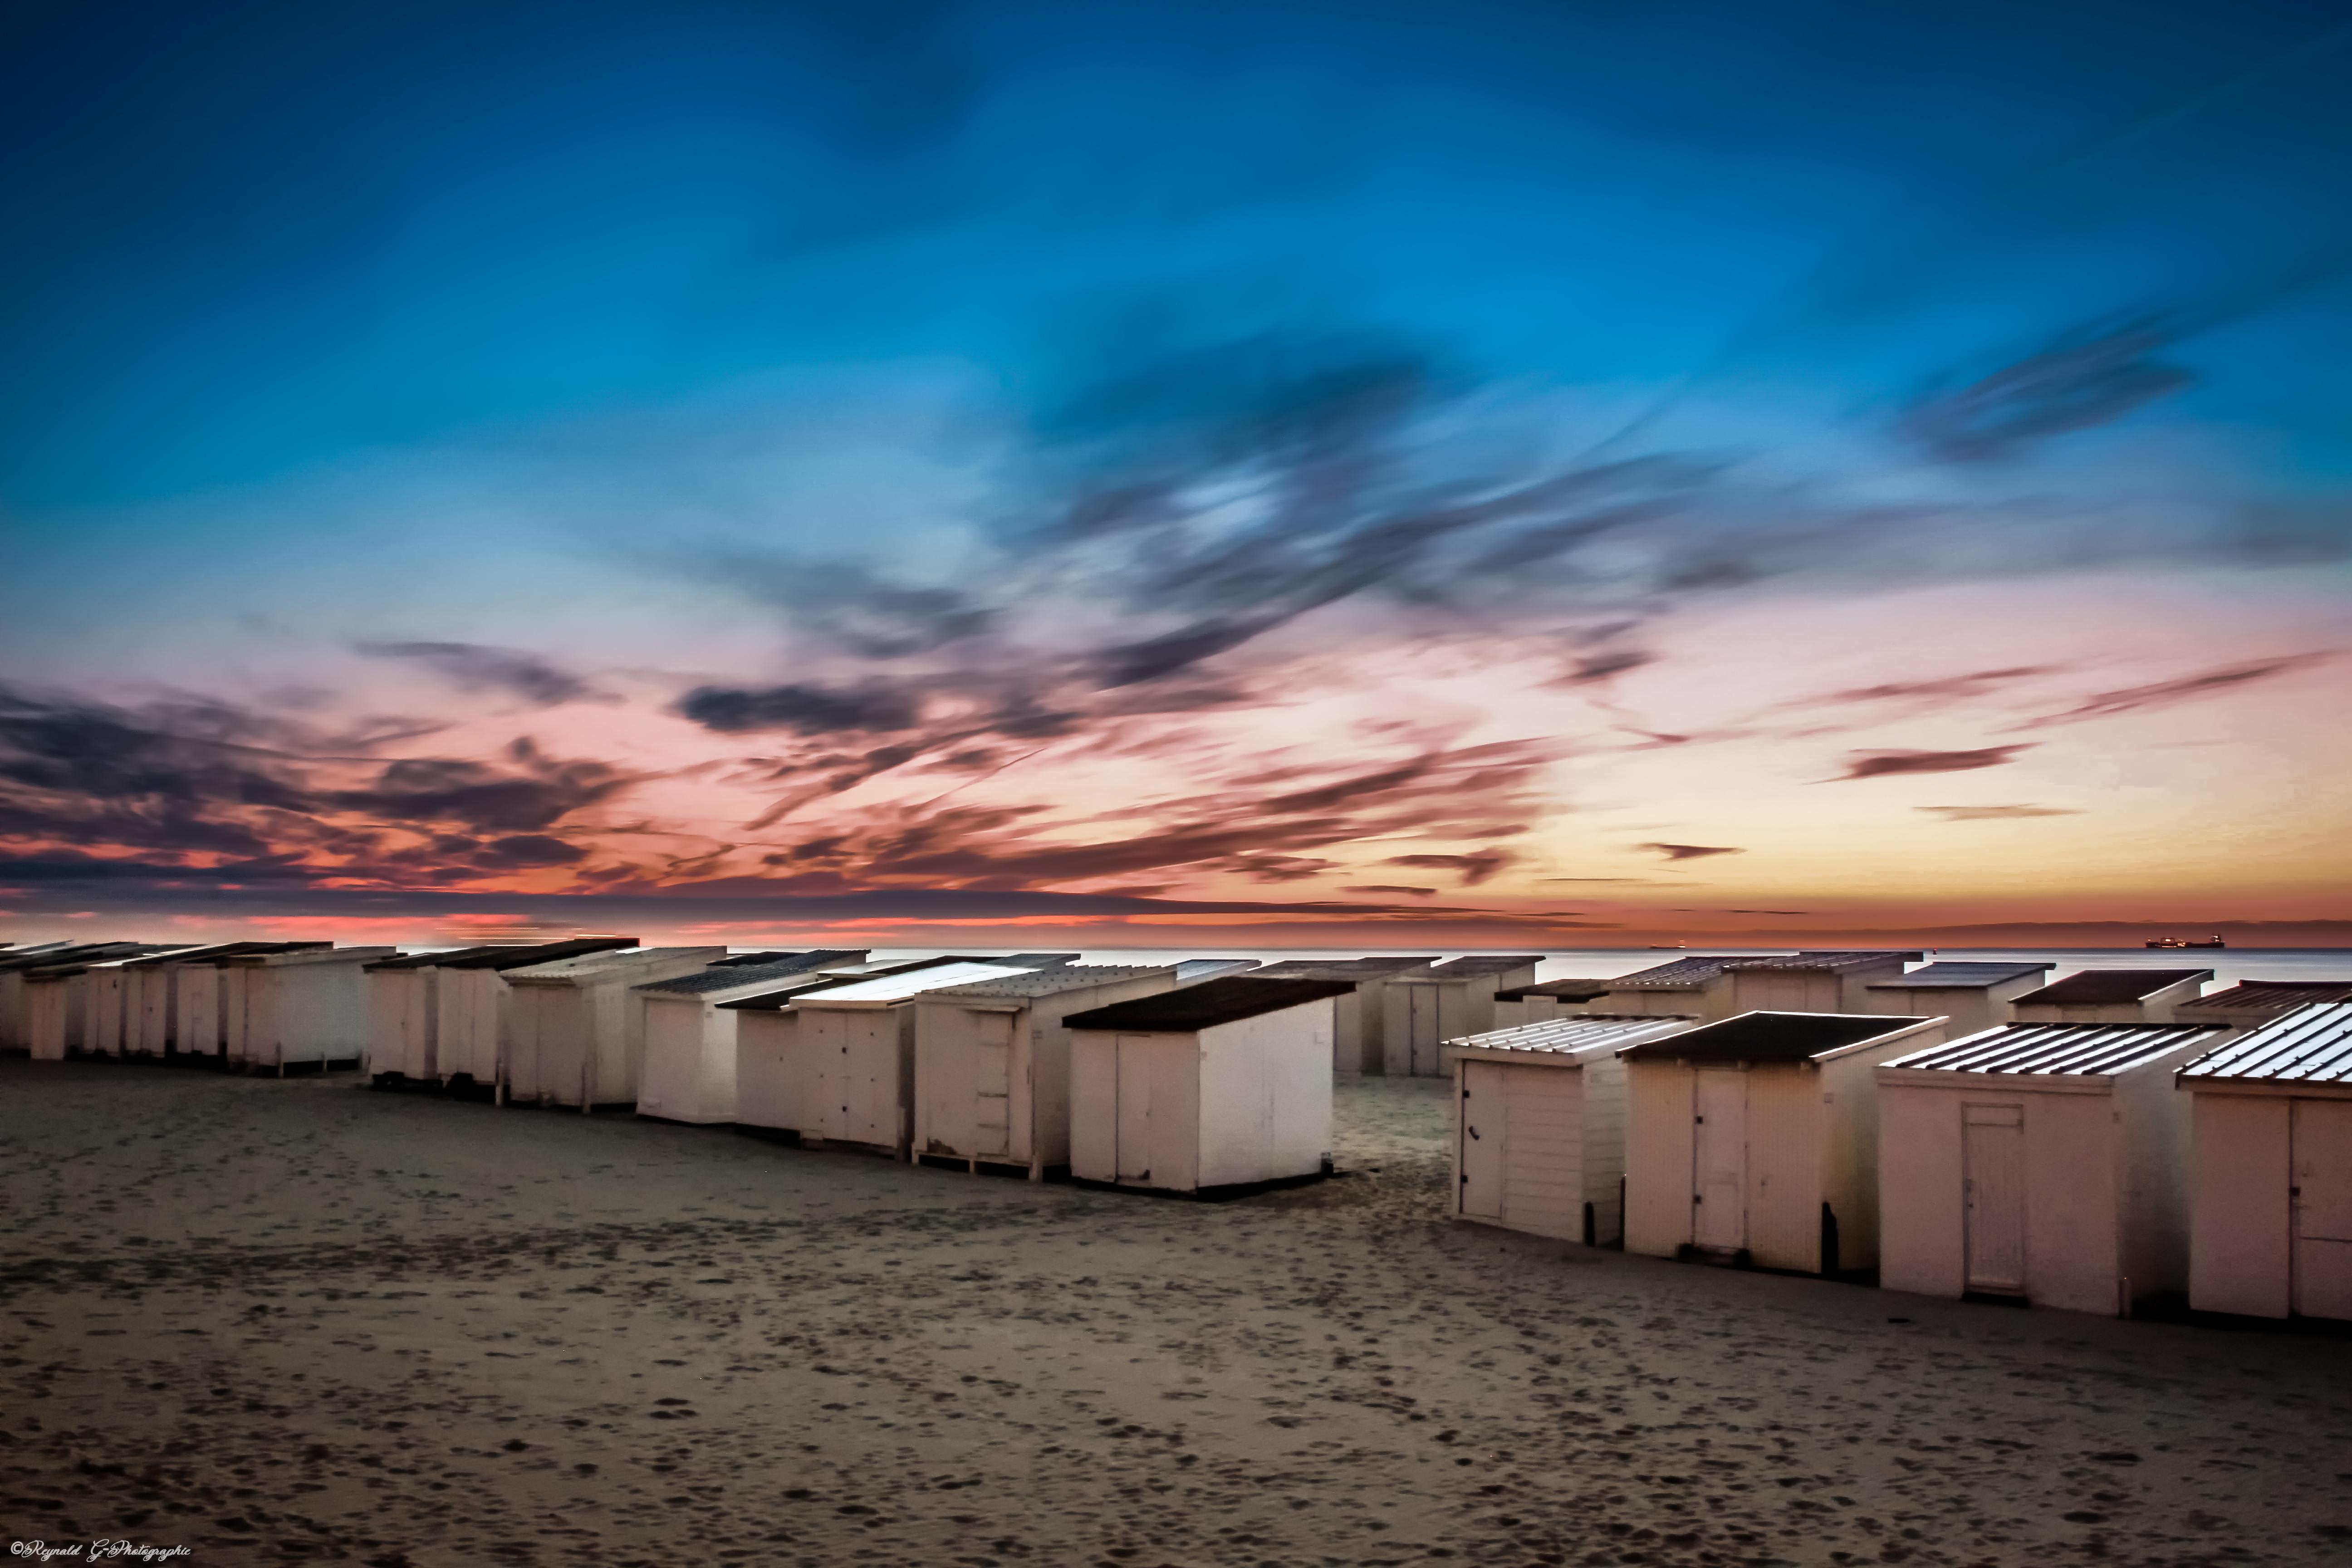 © Reynald Goubelle